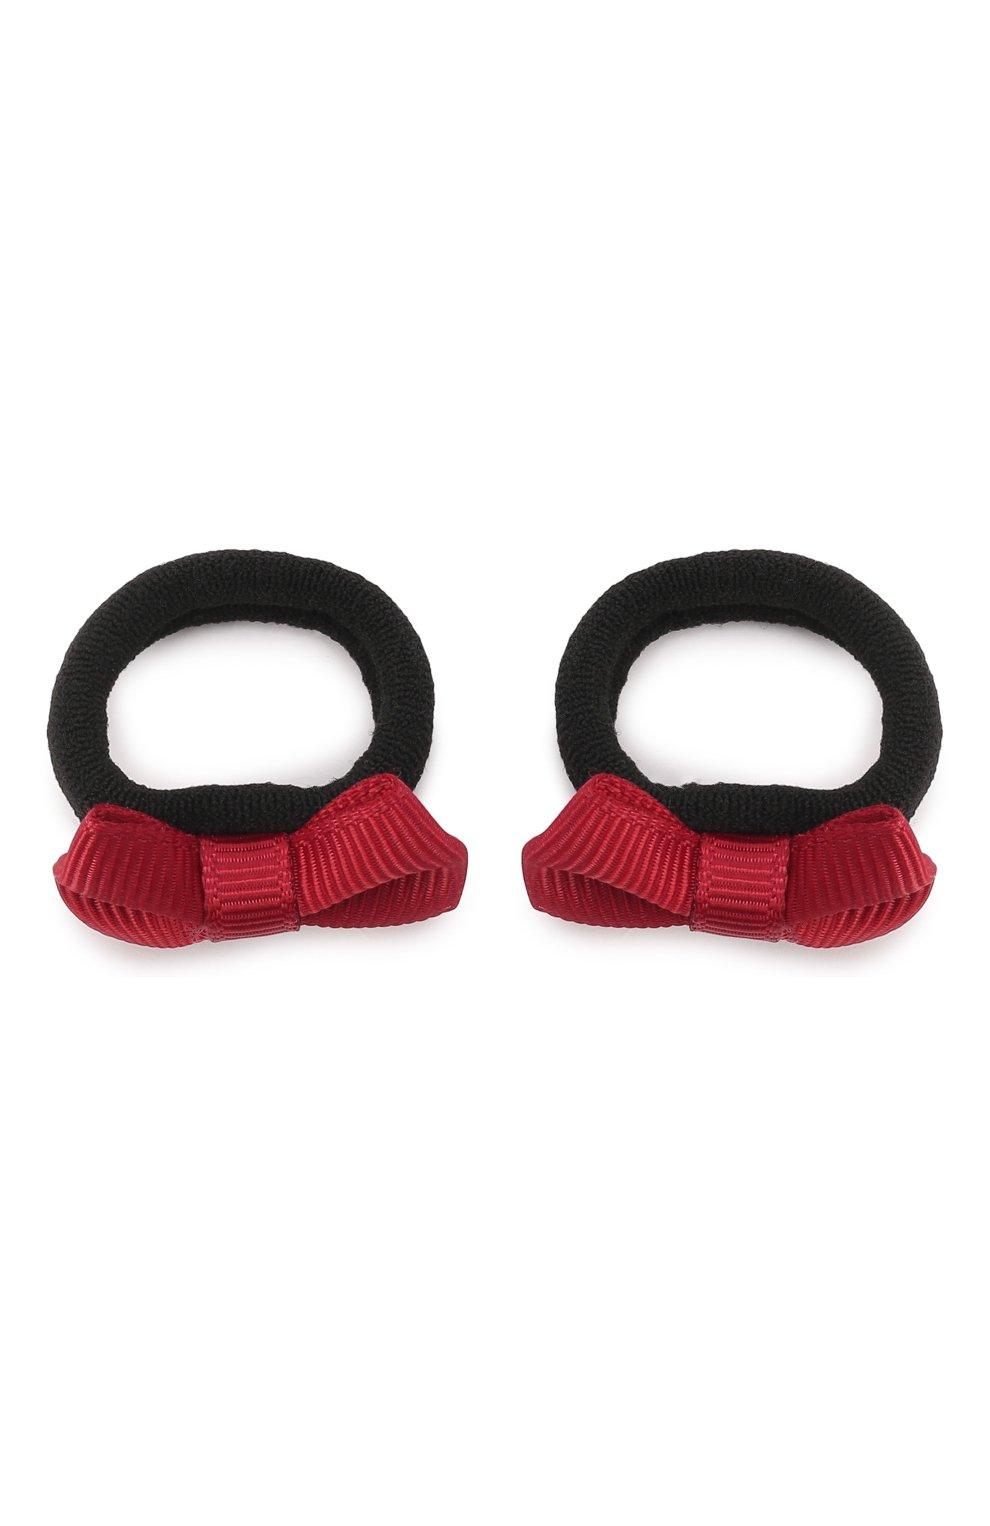 Детская комплект из 2-х резинок small bow JUNEFEE красного цвета, арт. 5704   Фото 1